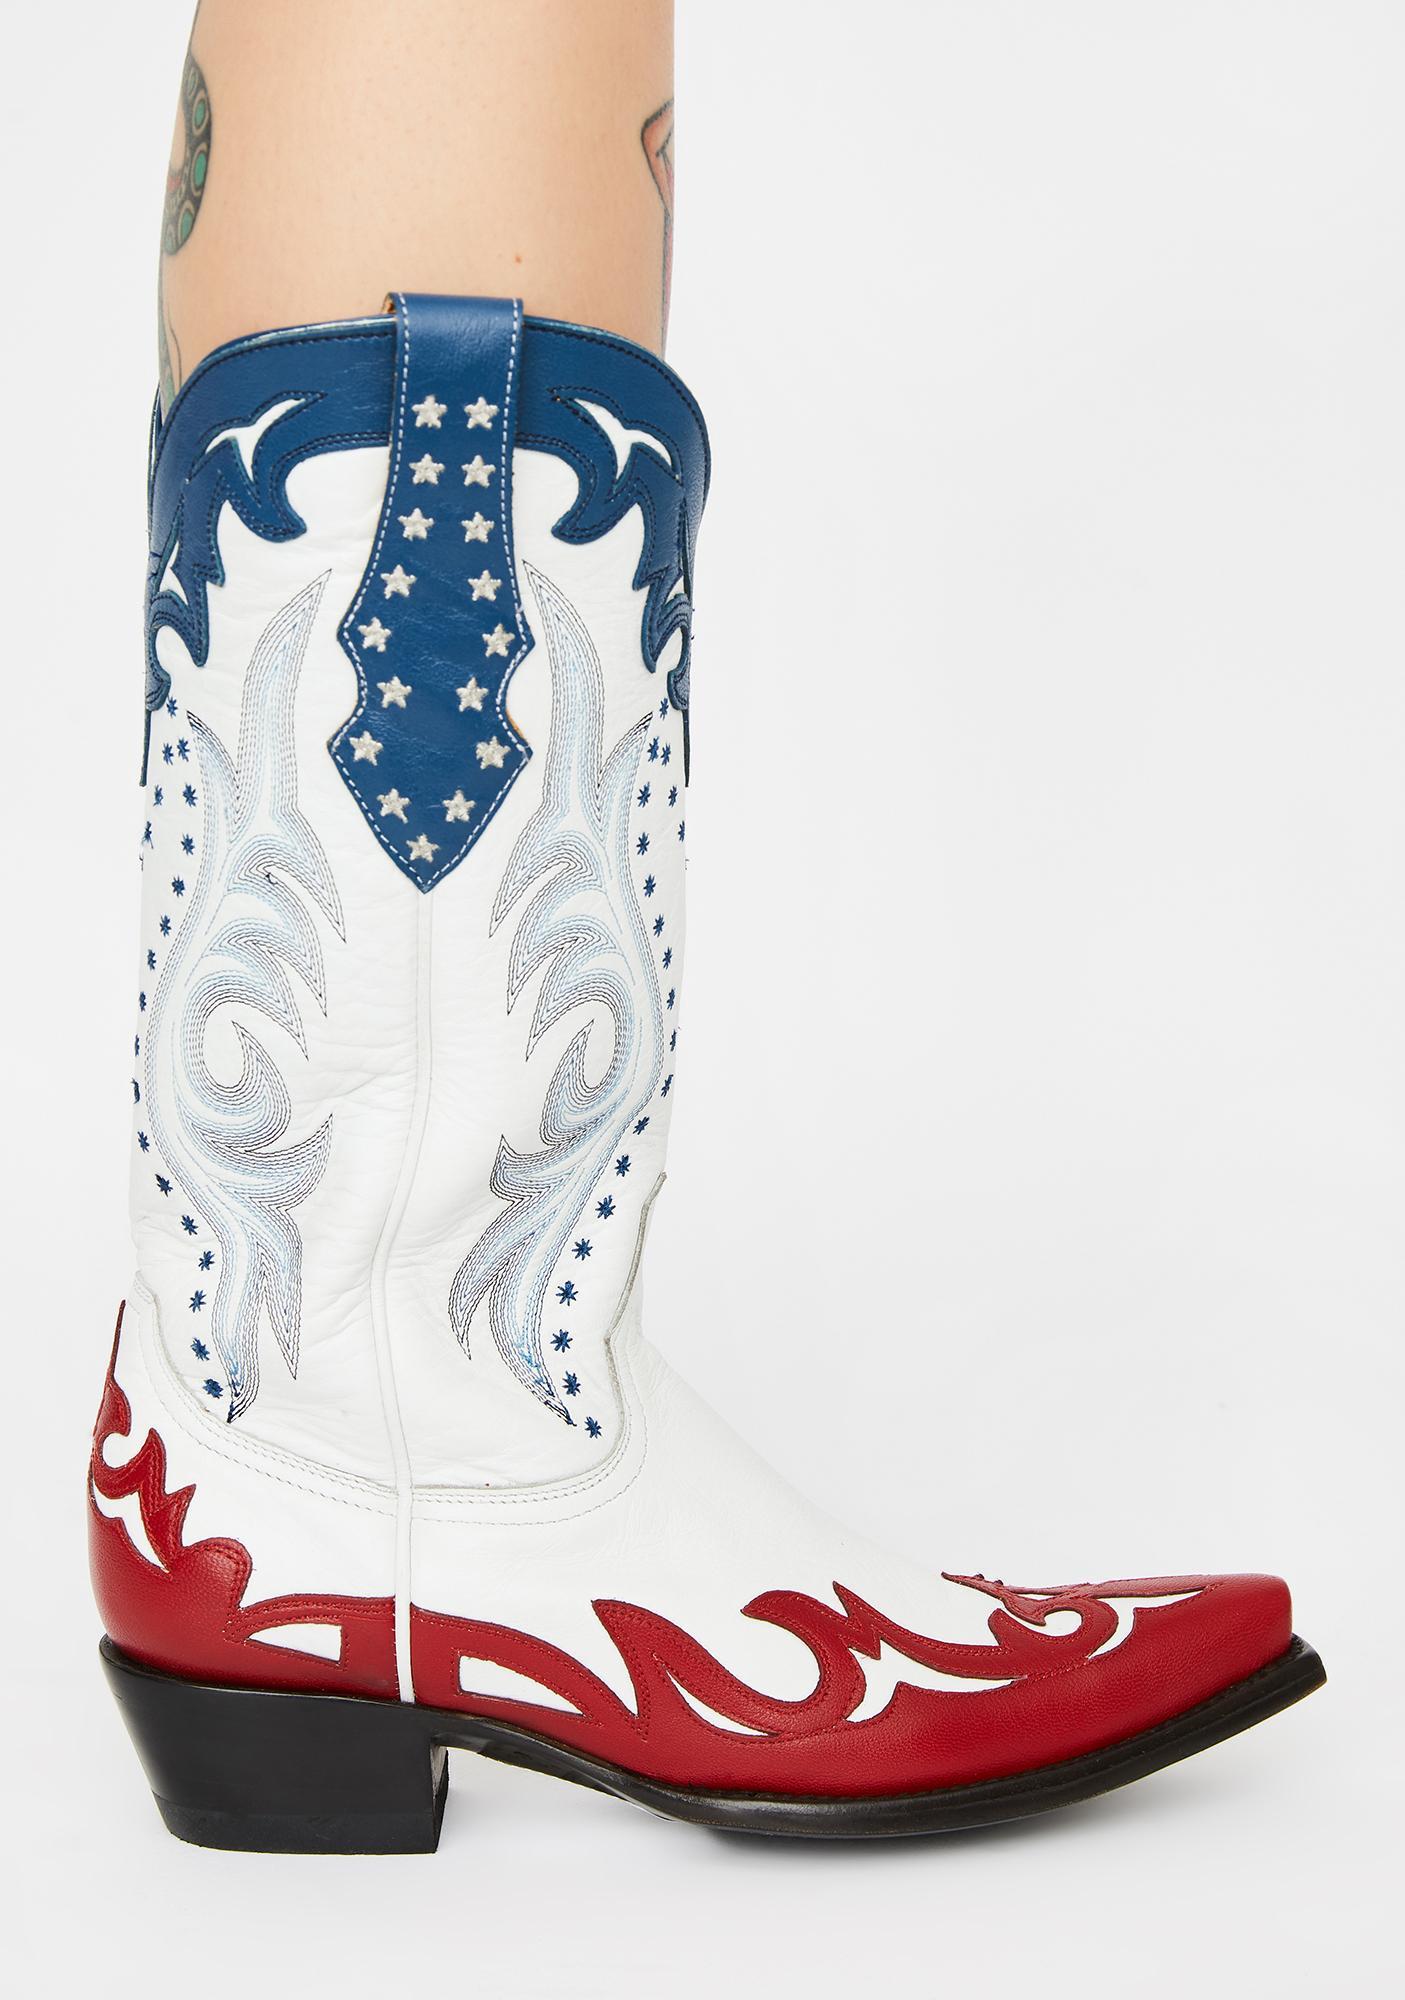 OLD GRINGO Vencida Cowboy Boots